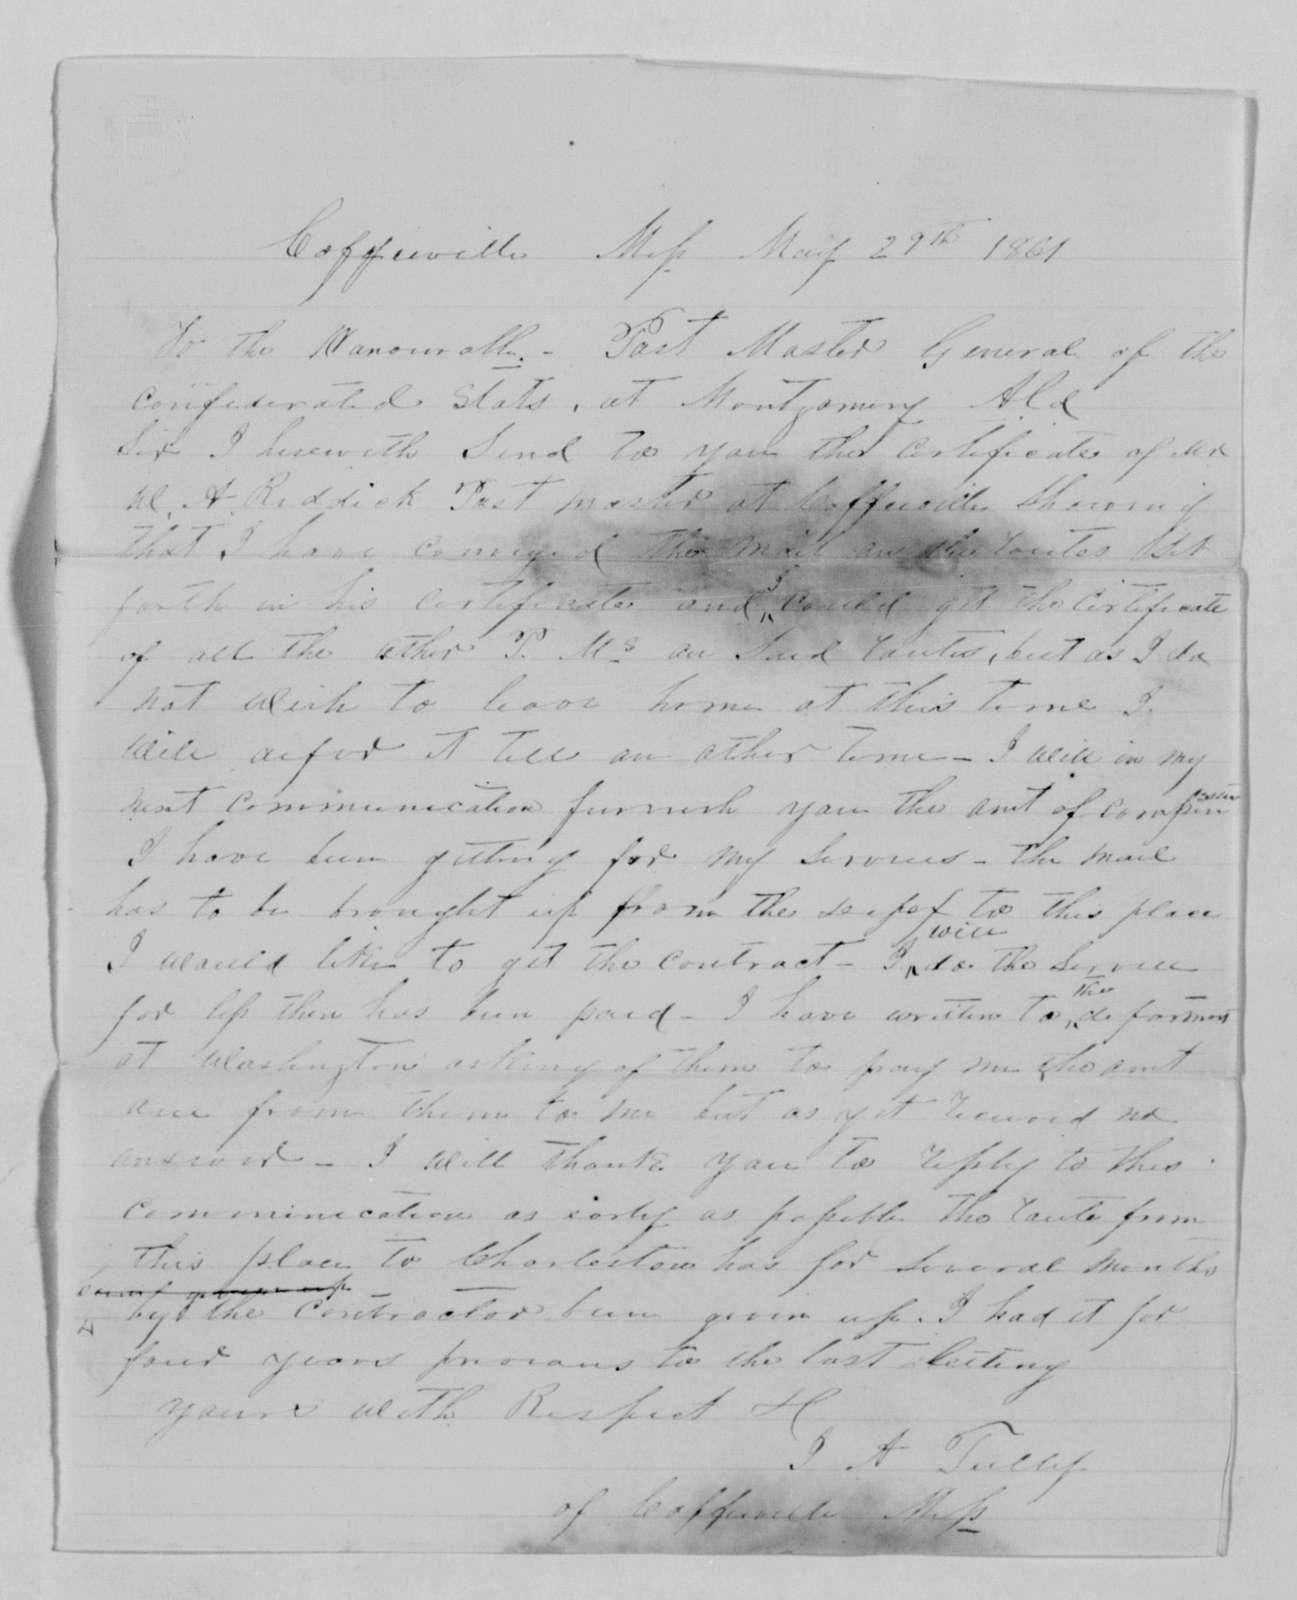 Confederate States of America records: Microfilm Reel 55